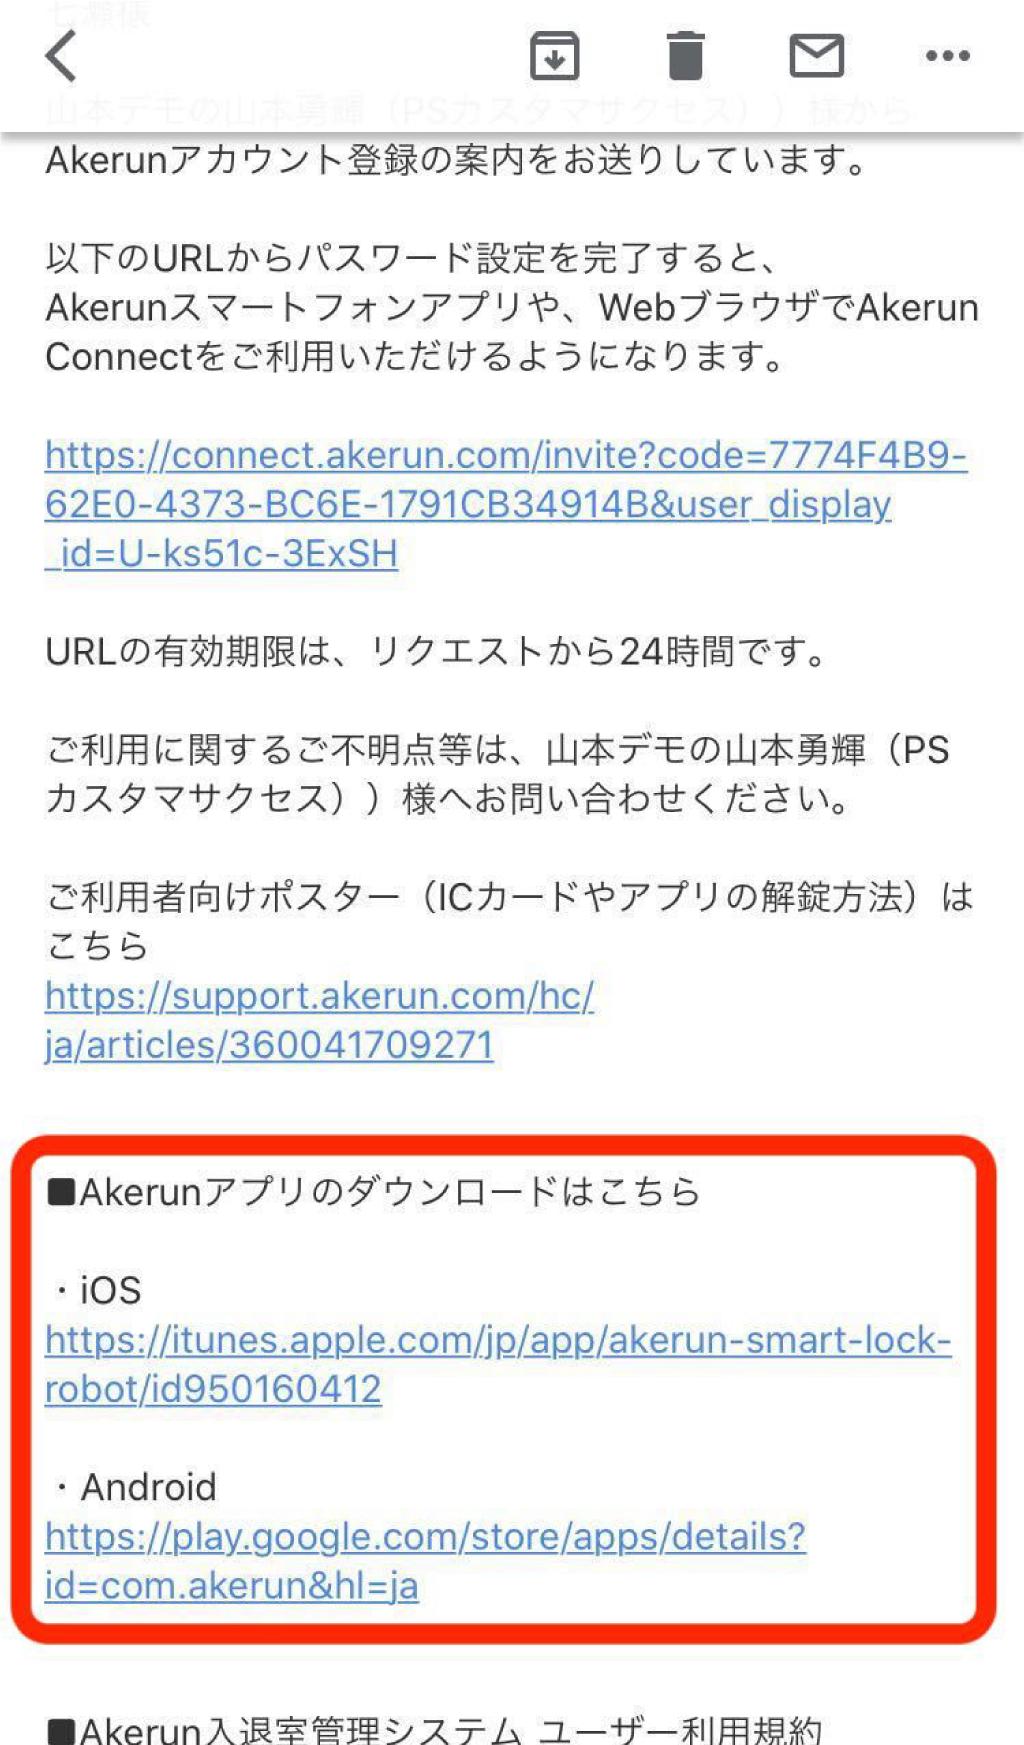 Akerunアプリダウンロード